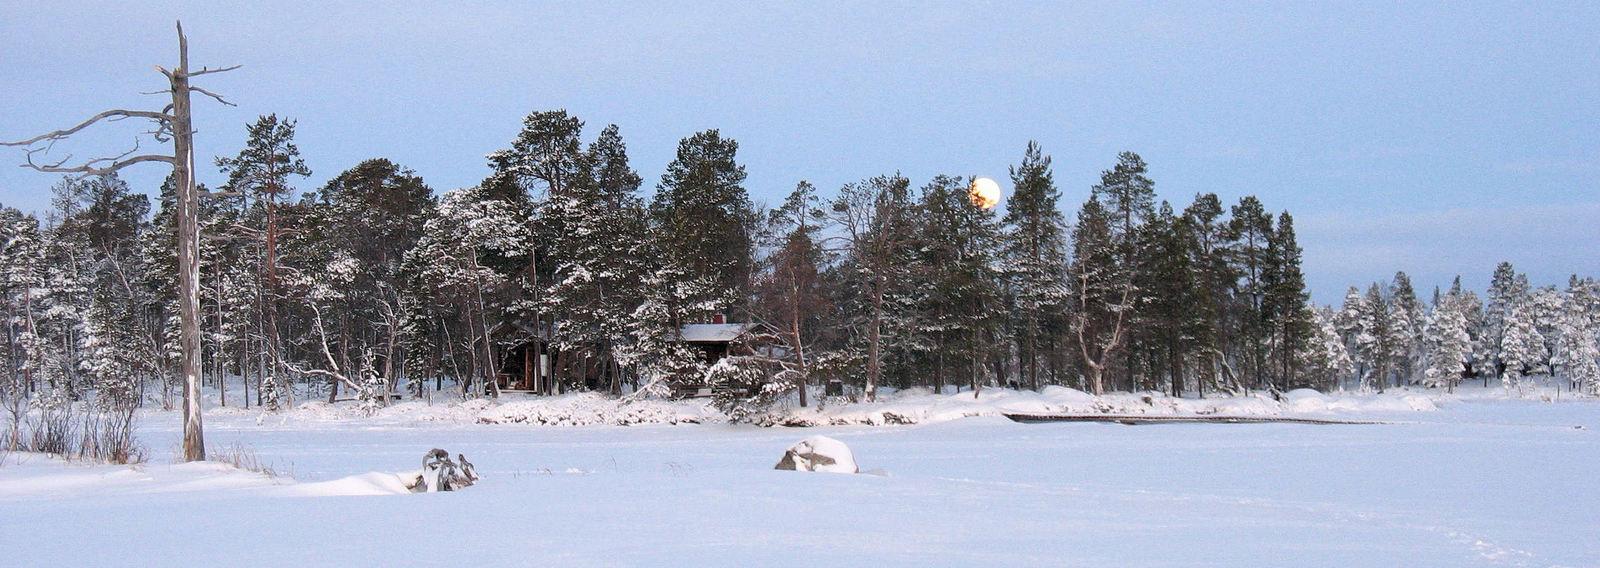 Dog Sledding Tour, Inari